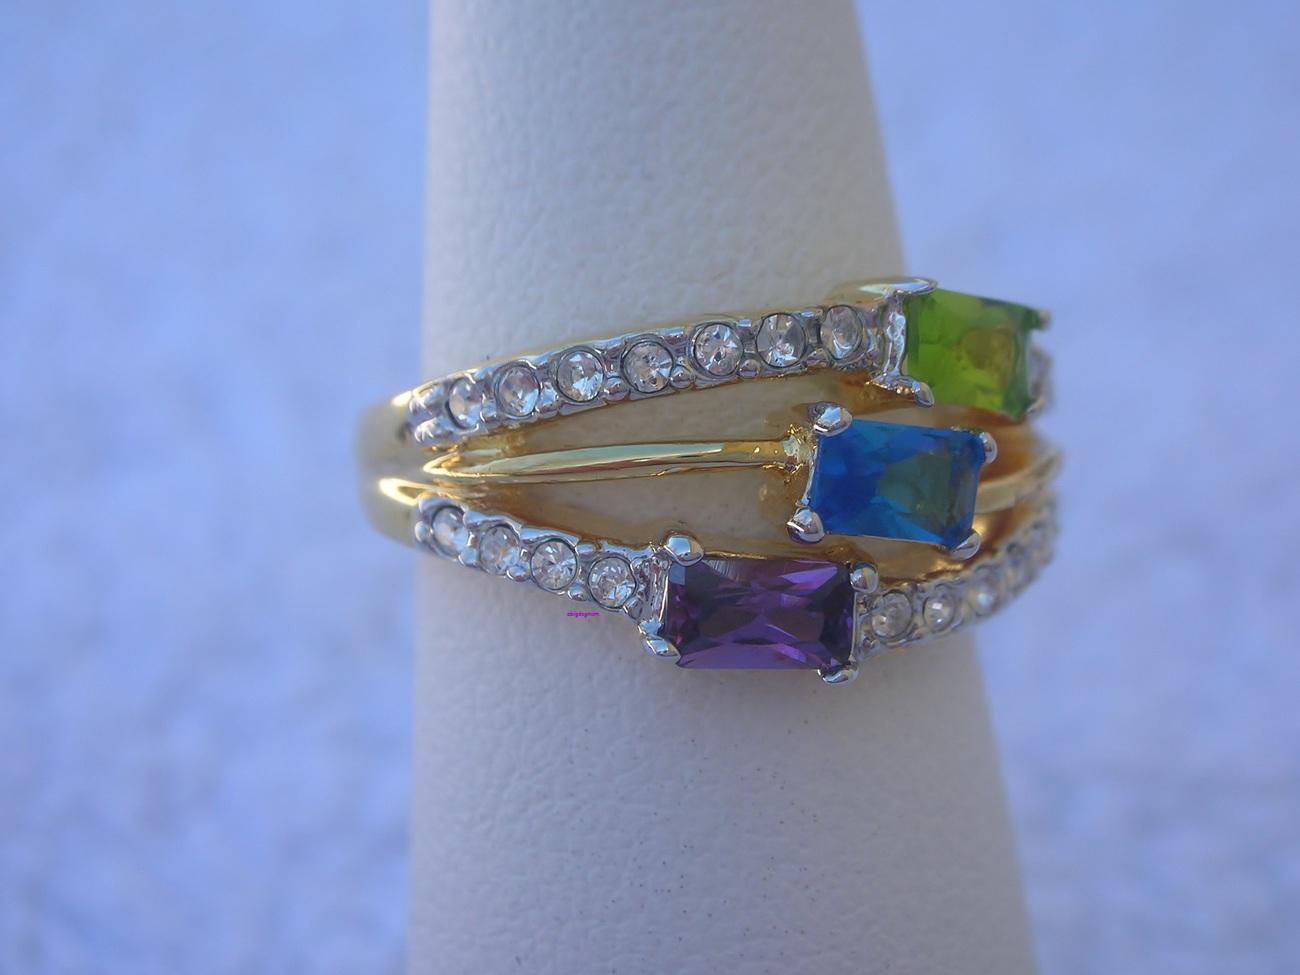 Peridot, Amethyst, Brazilian Blue Ladies Fashion Ring Size 8